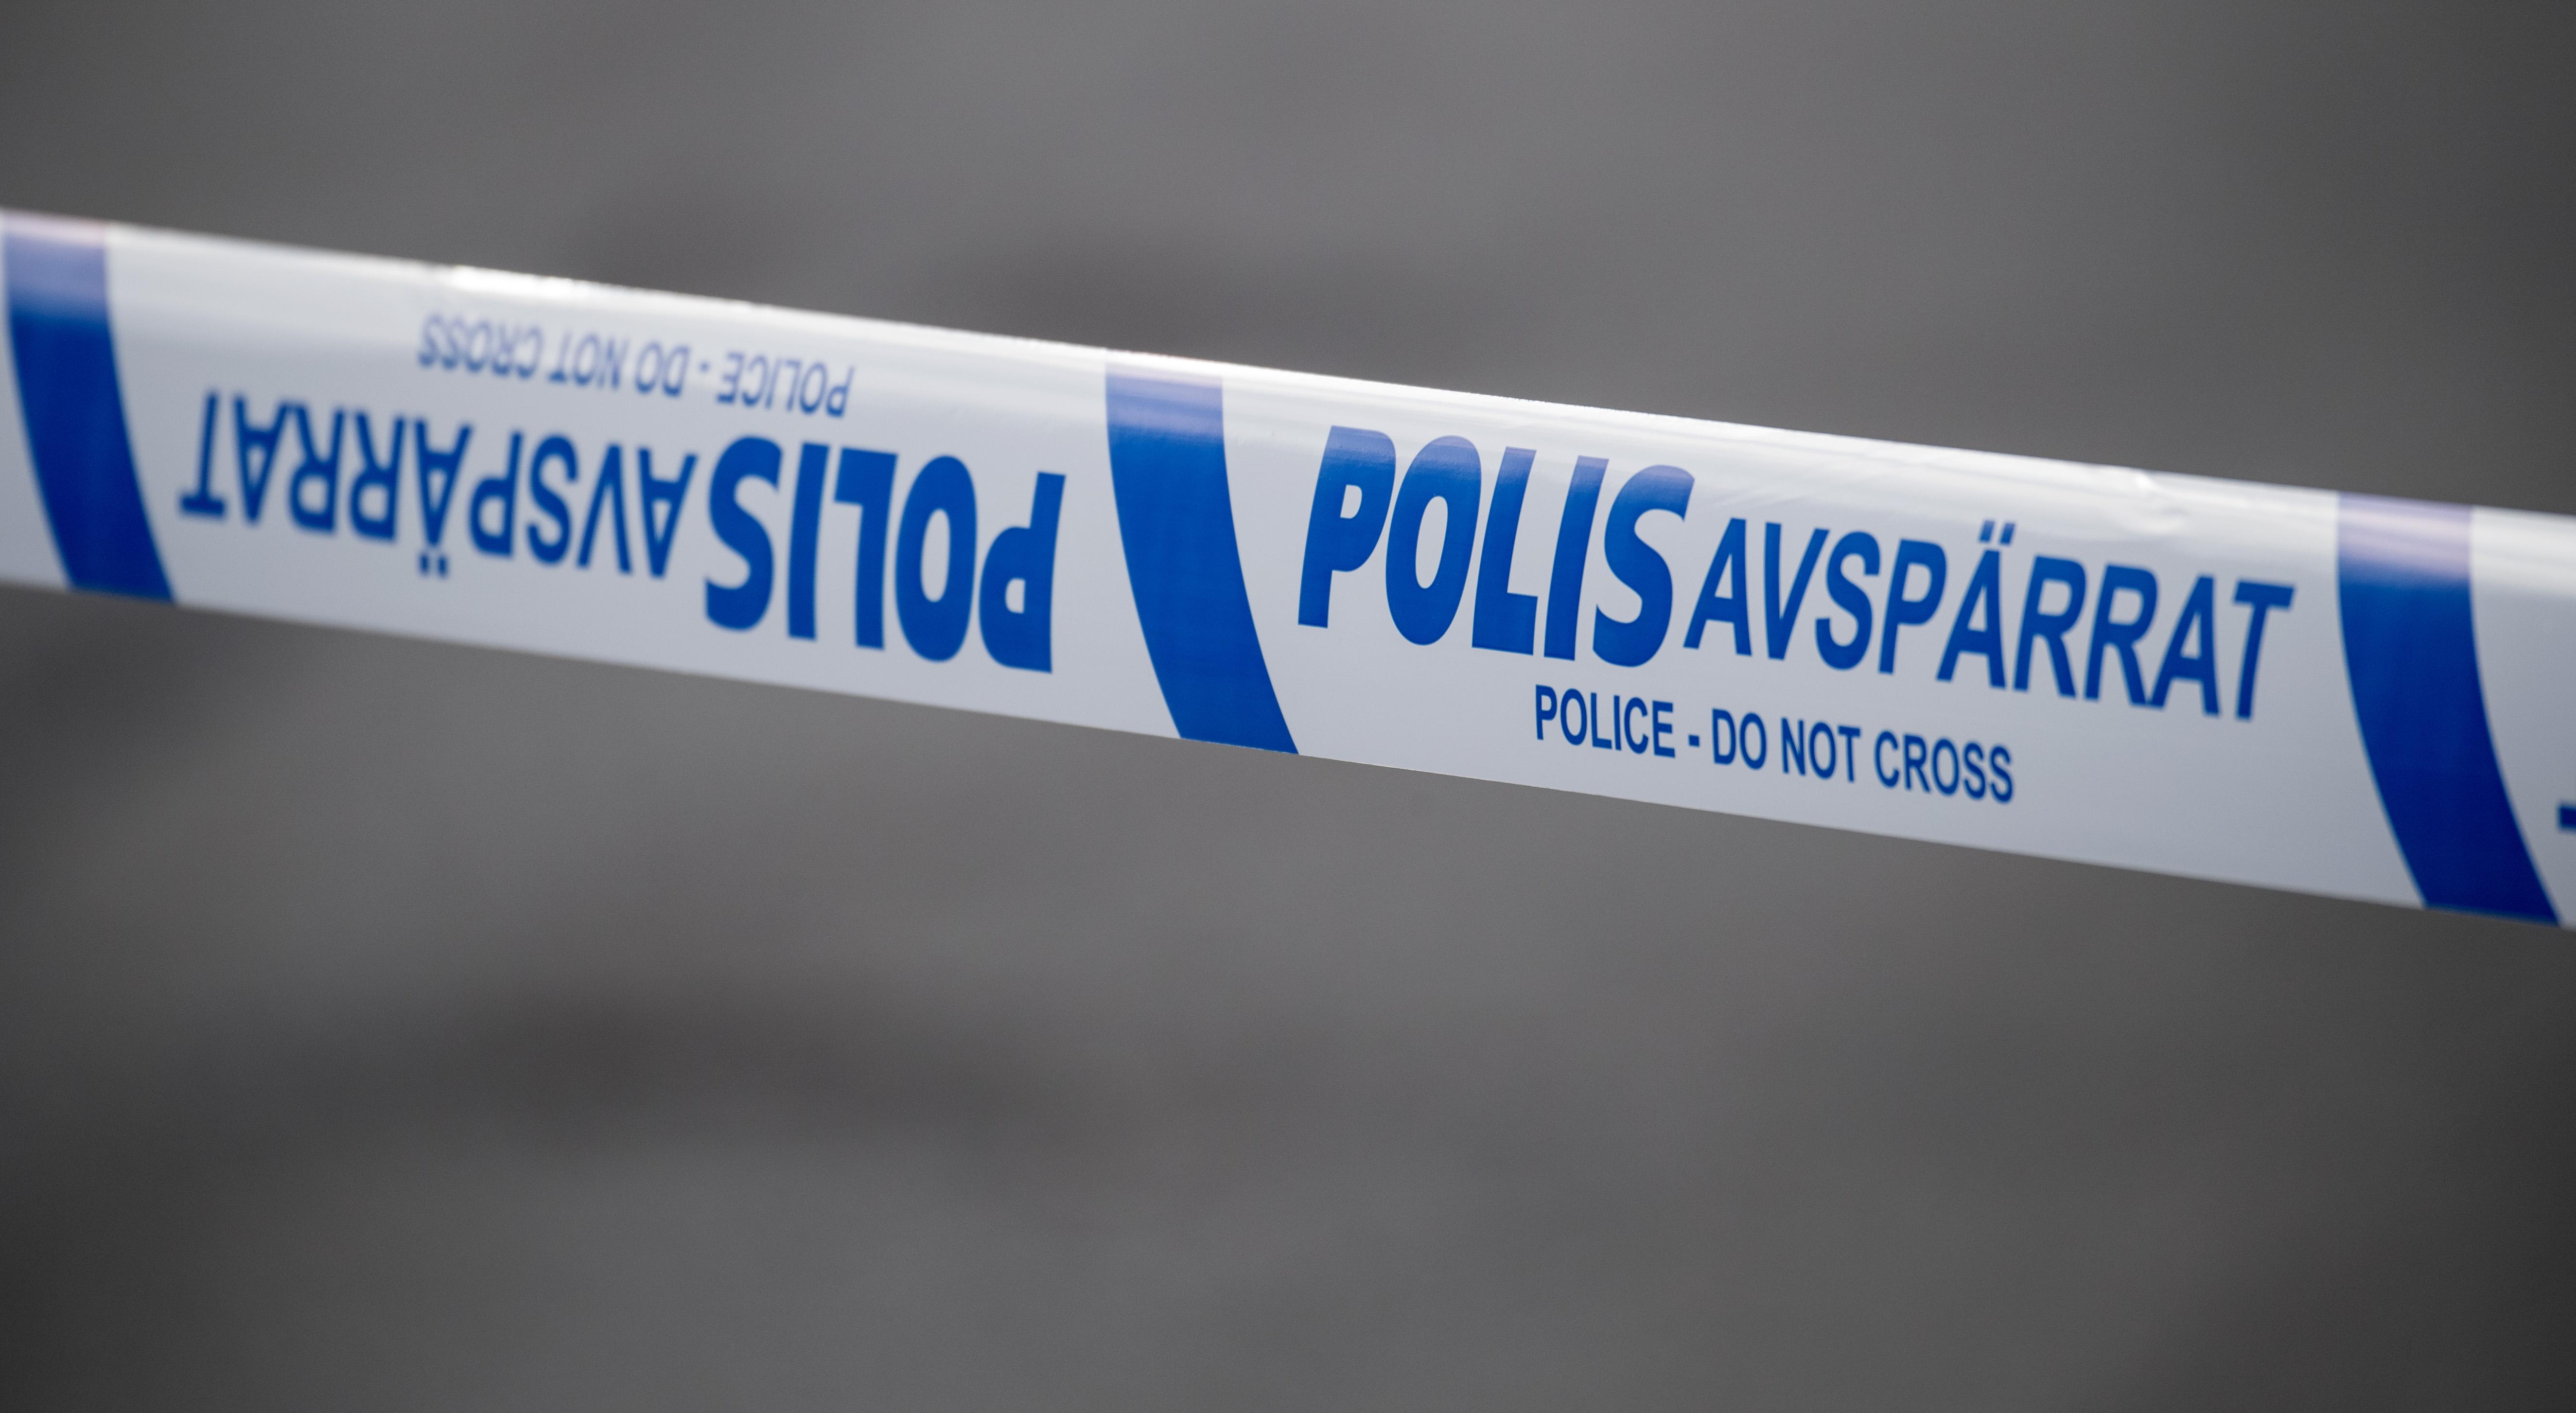 Utredning mot polis nedlagd var inte misshandel